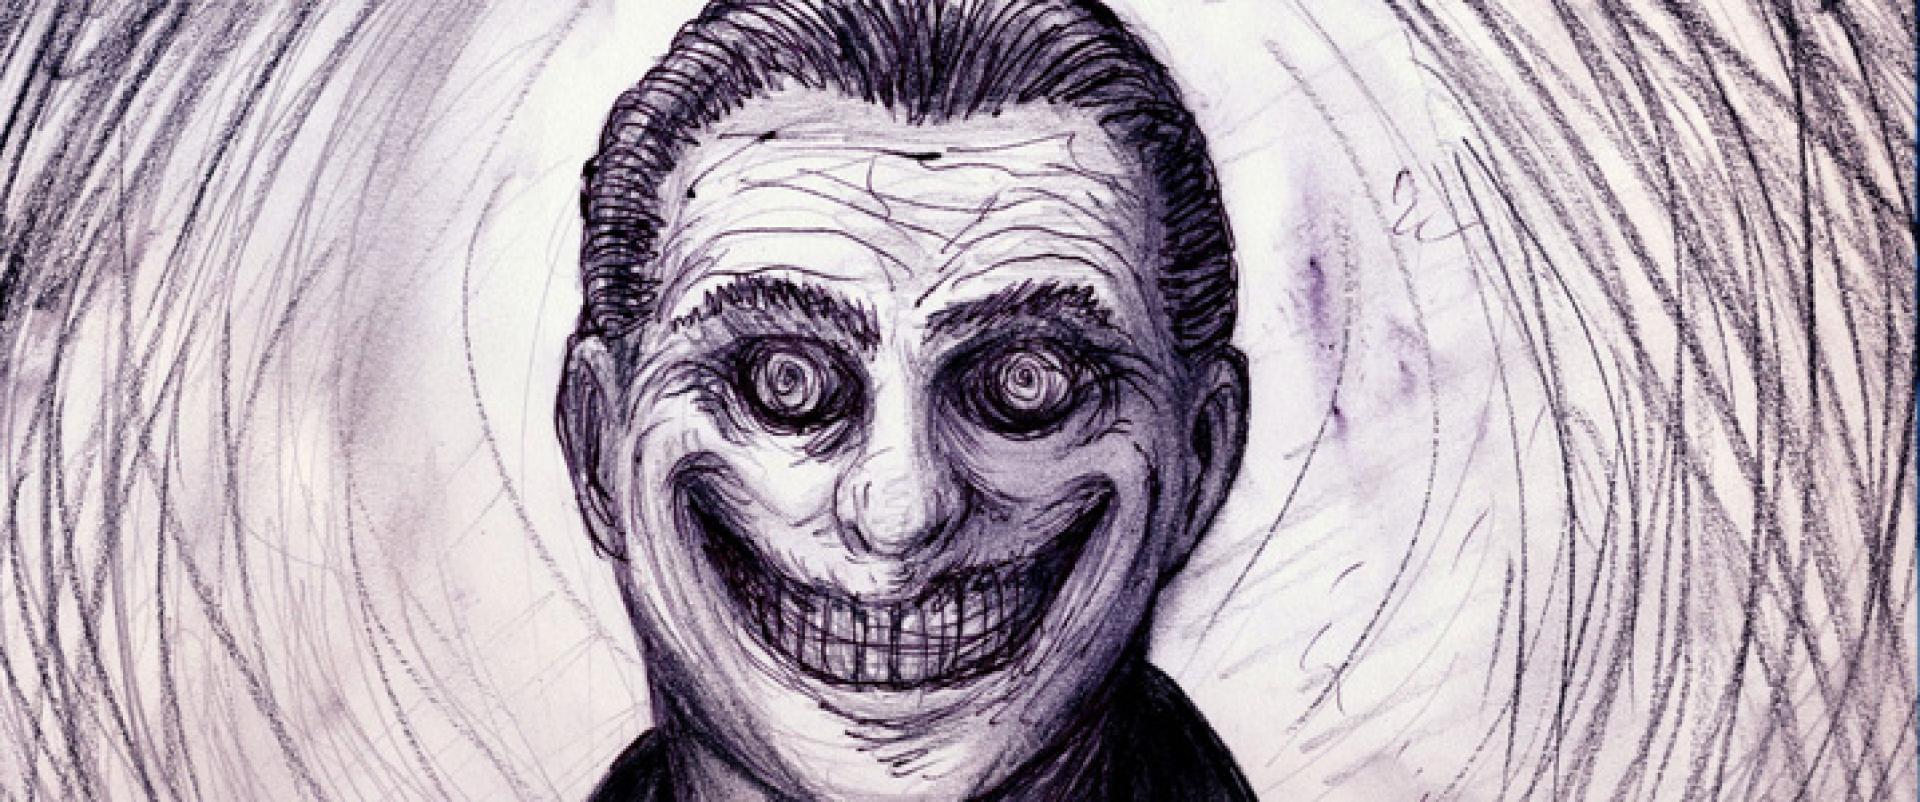 The Smiling Man - A mosolygó férfi